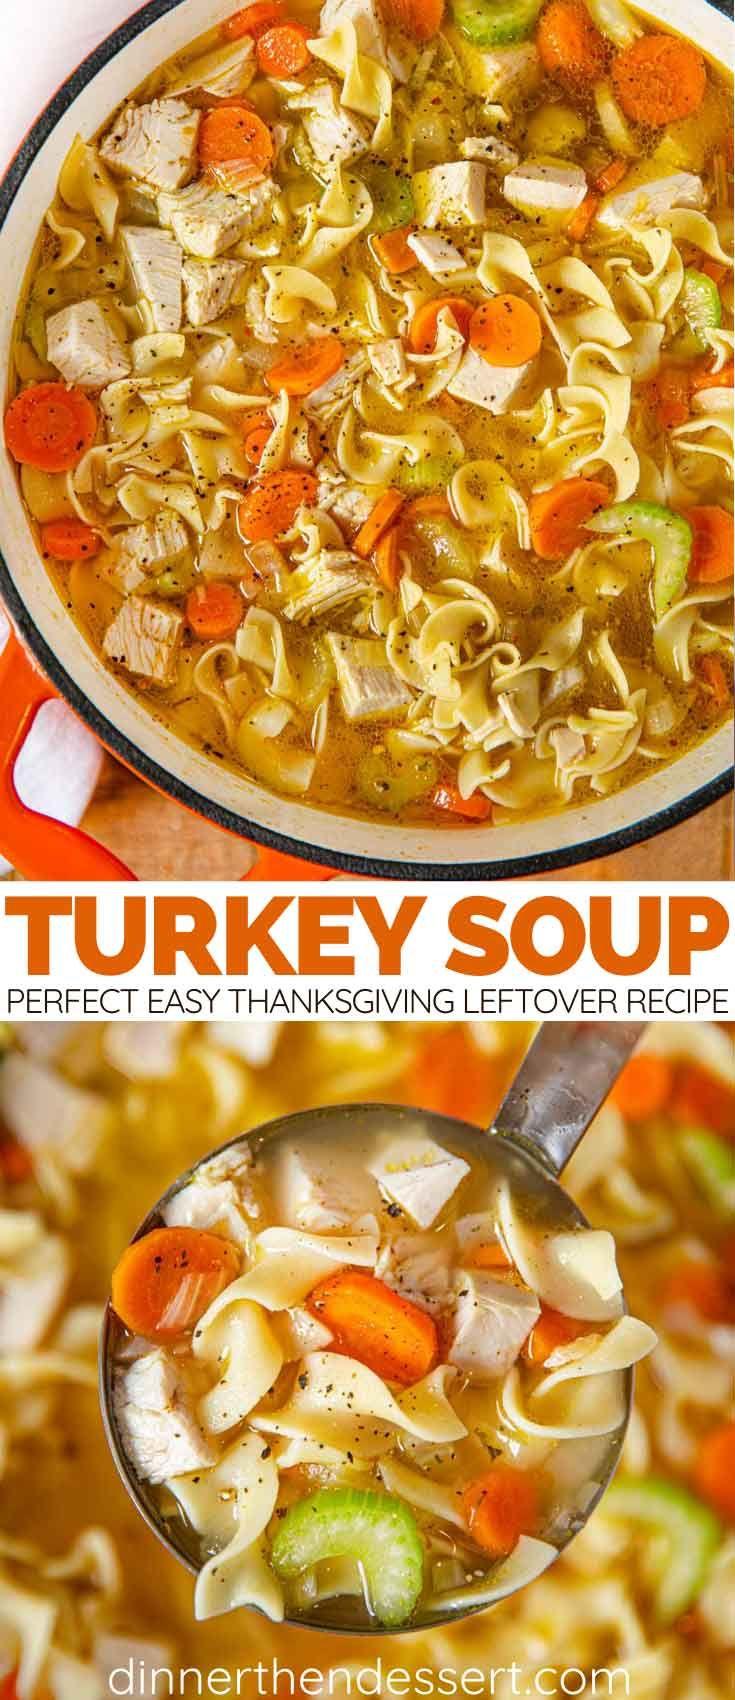 Turkey Soup Recipe - Dinner, then Dessert